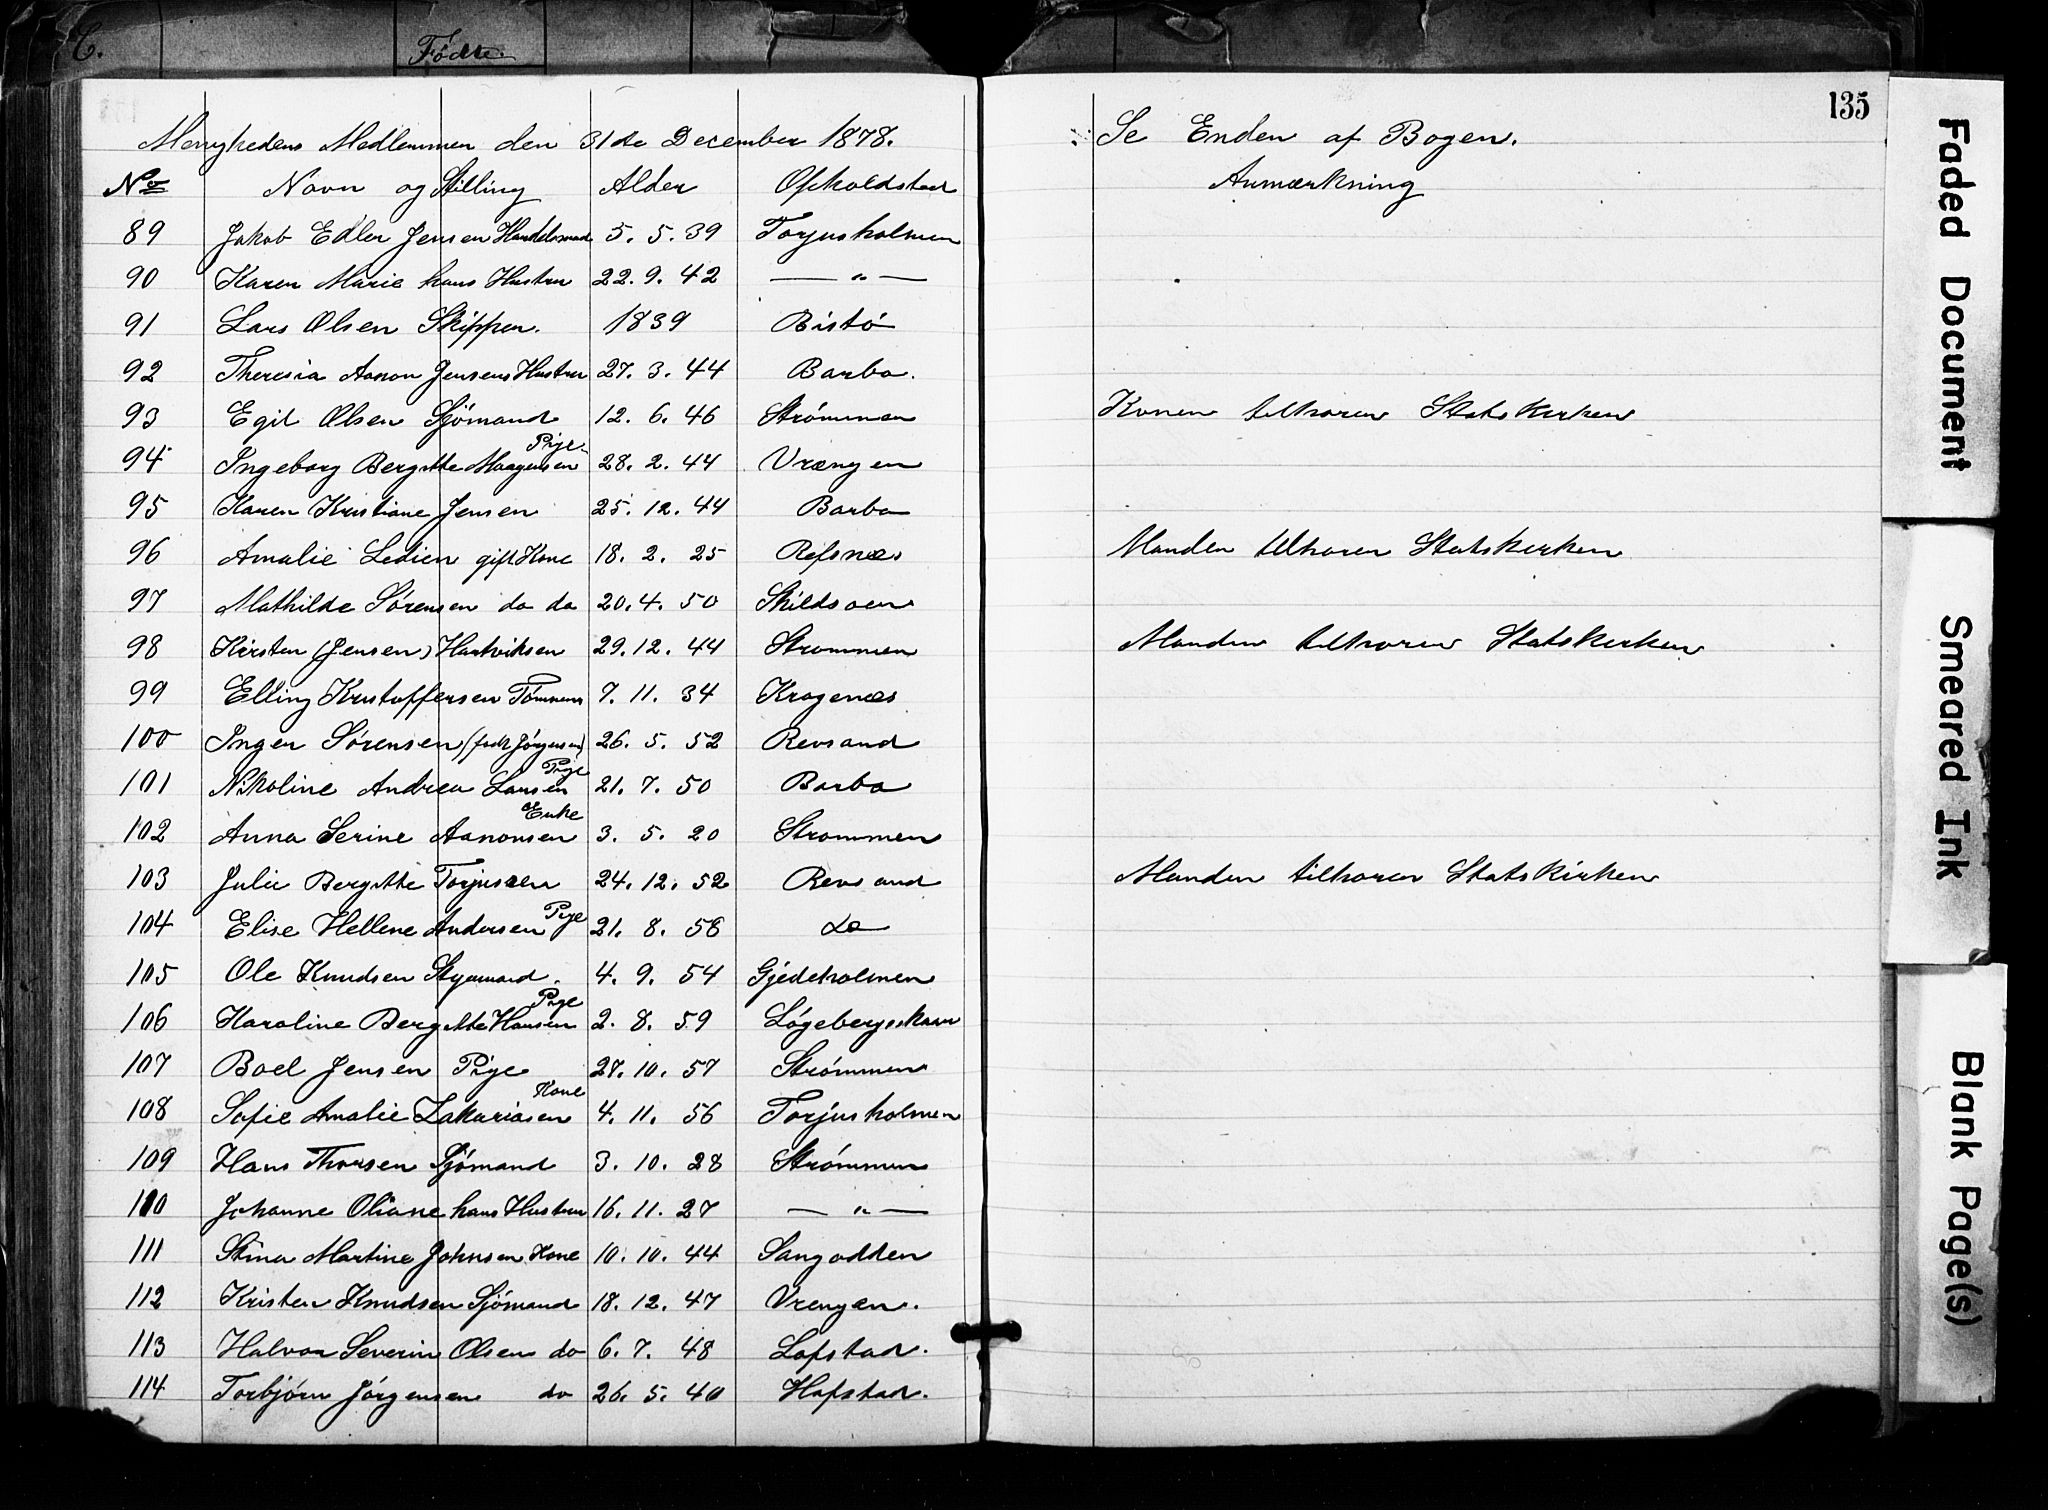 SAK, Metodistmenigheten, Arendal, F/Fa/L0001: Dissenterprotokoll nr. F-2, 1867-1879, s. 135